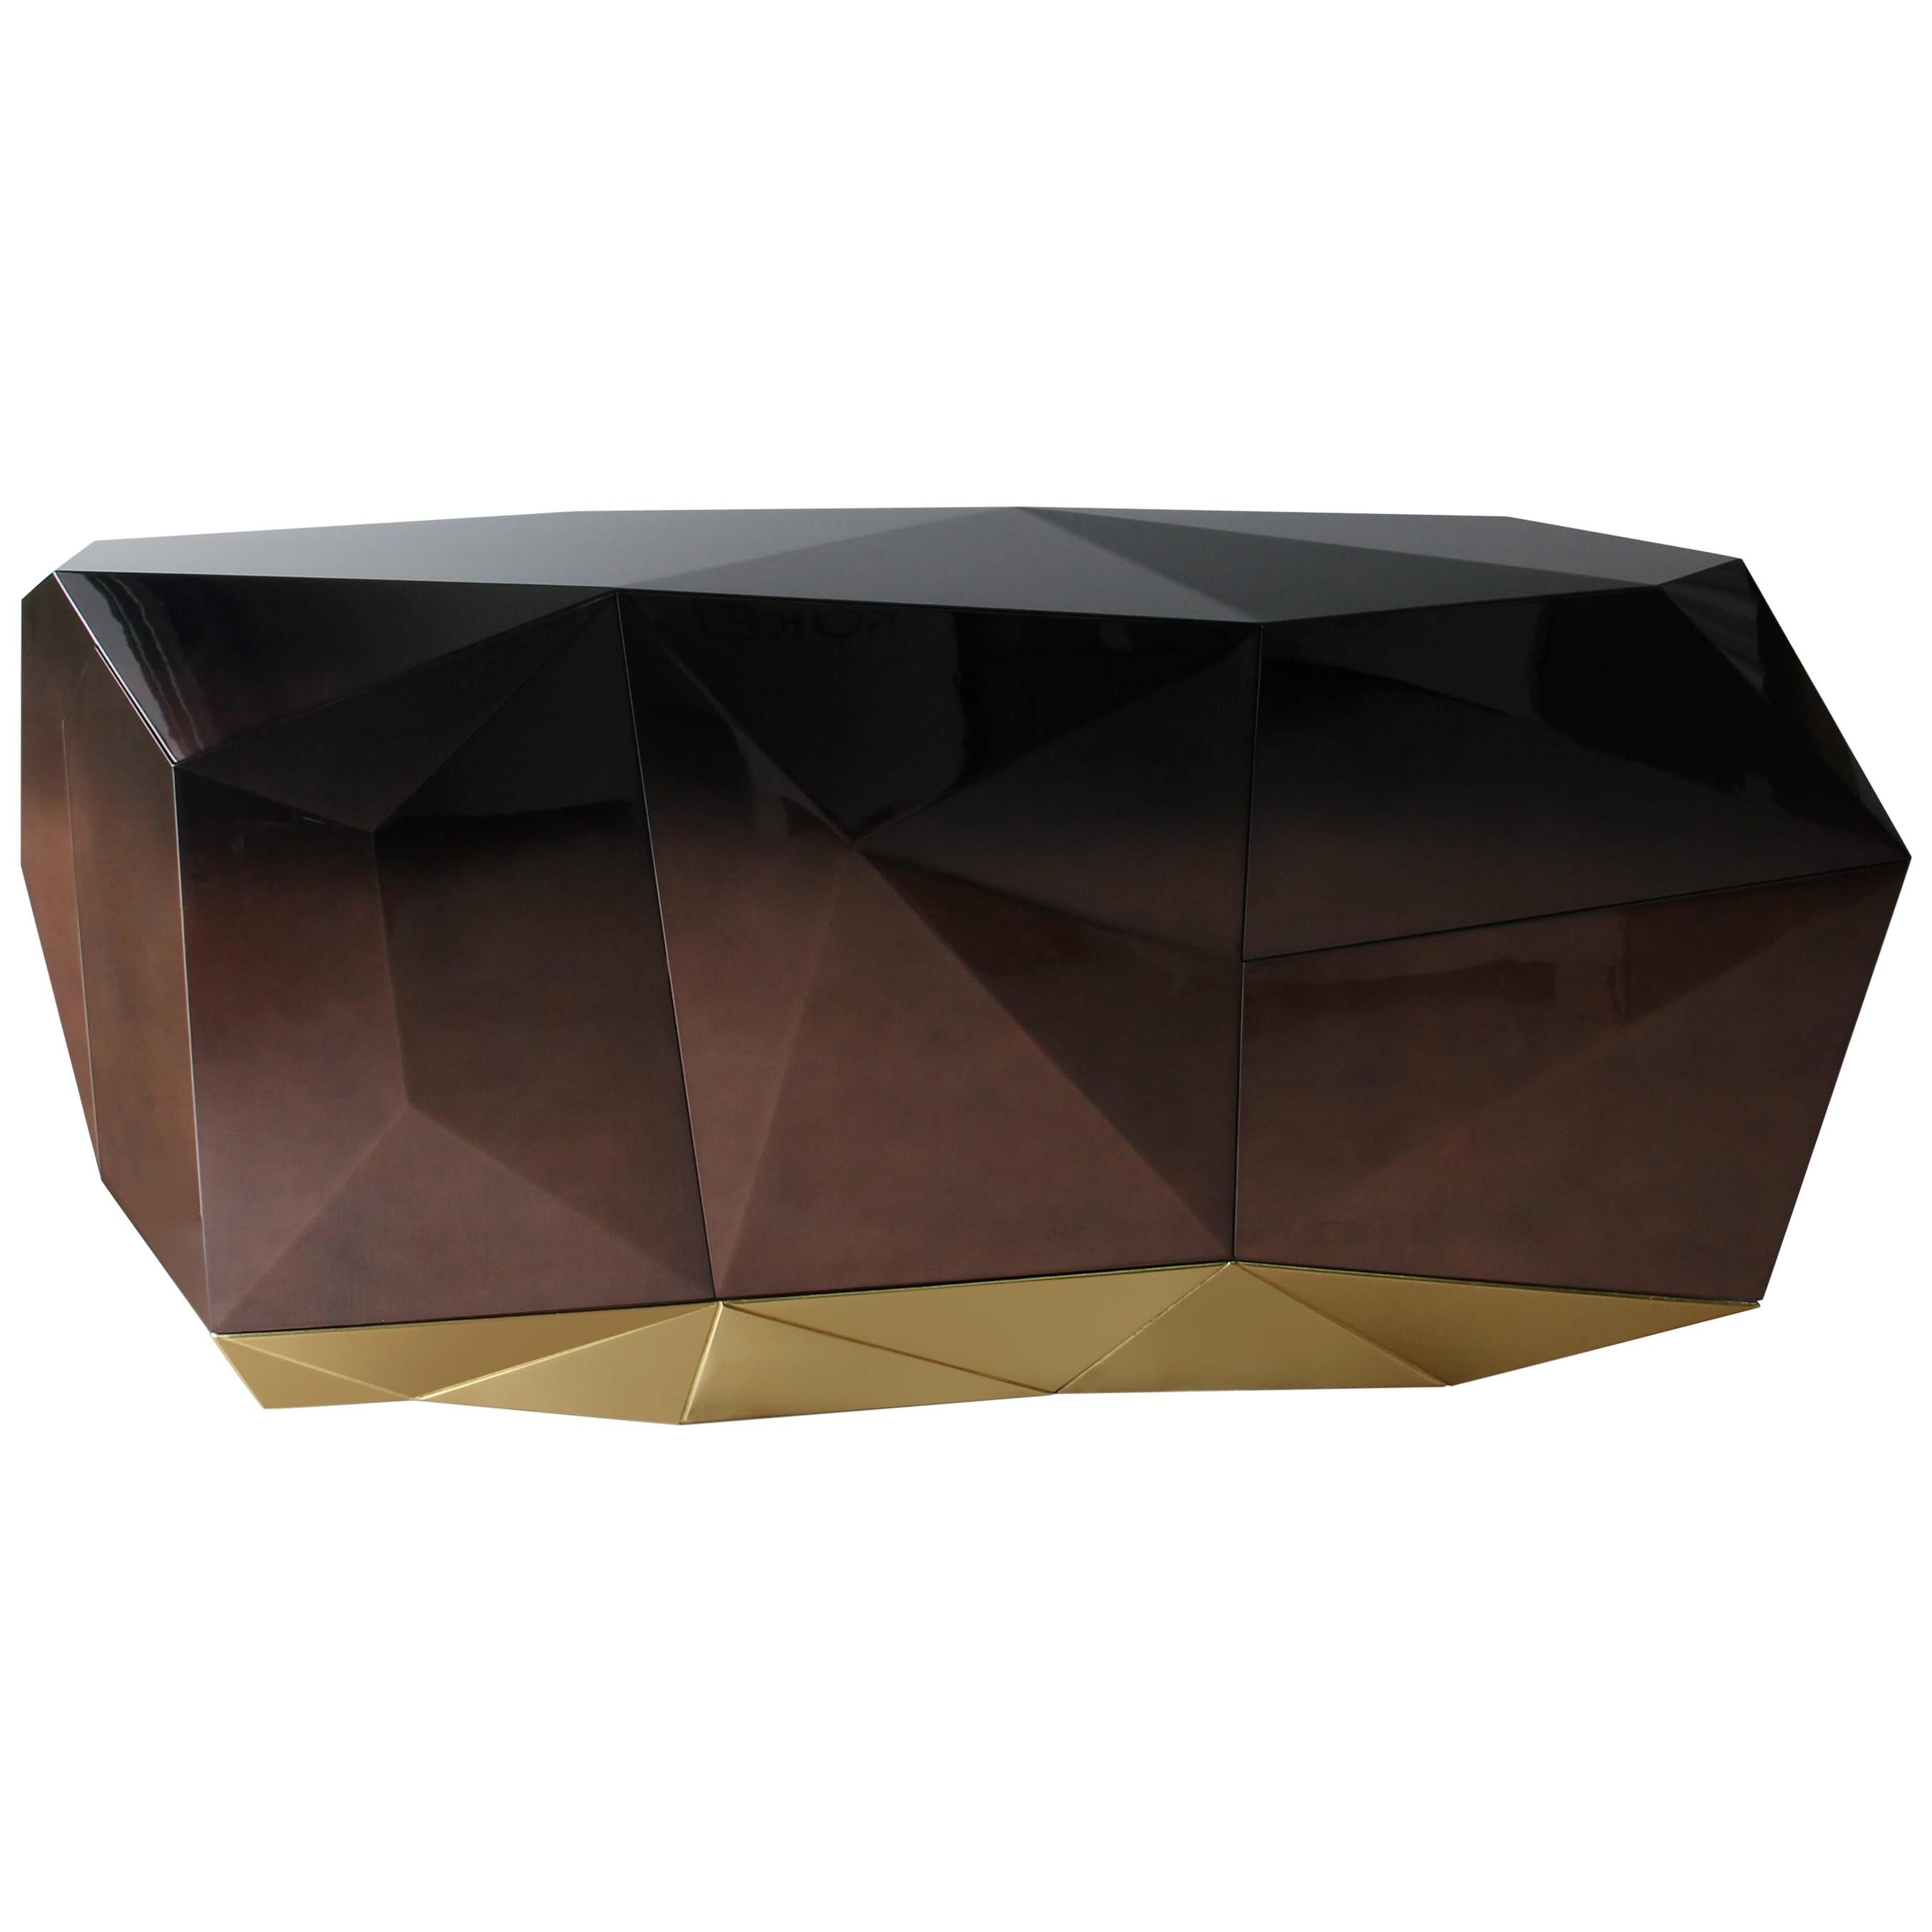 Diamond Chocolate Sideboard